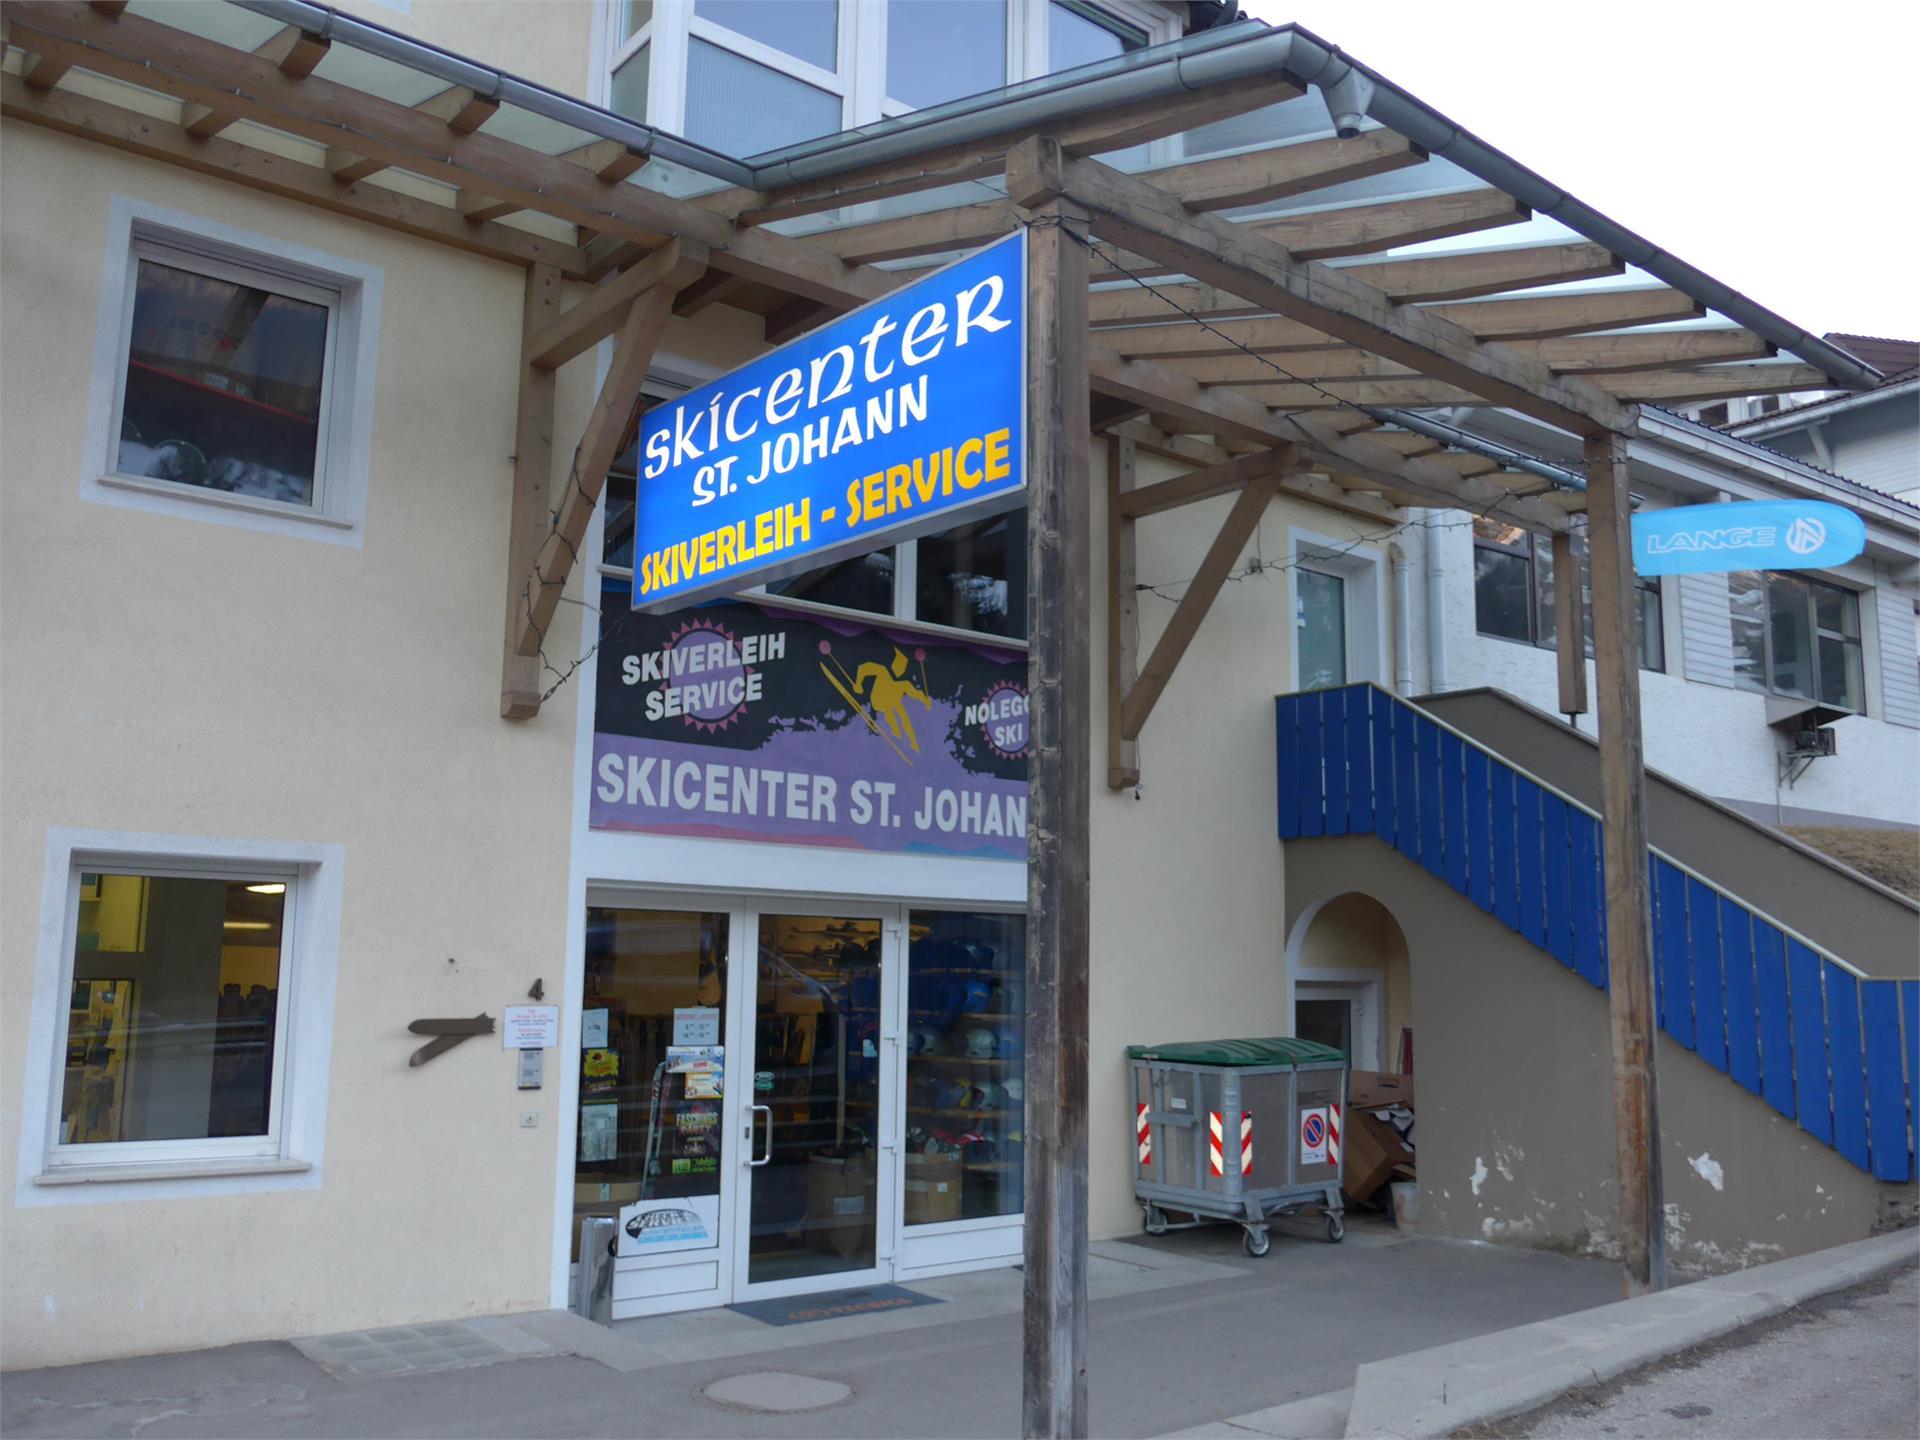 Skicenter - St. Johann